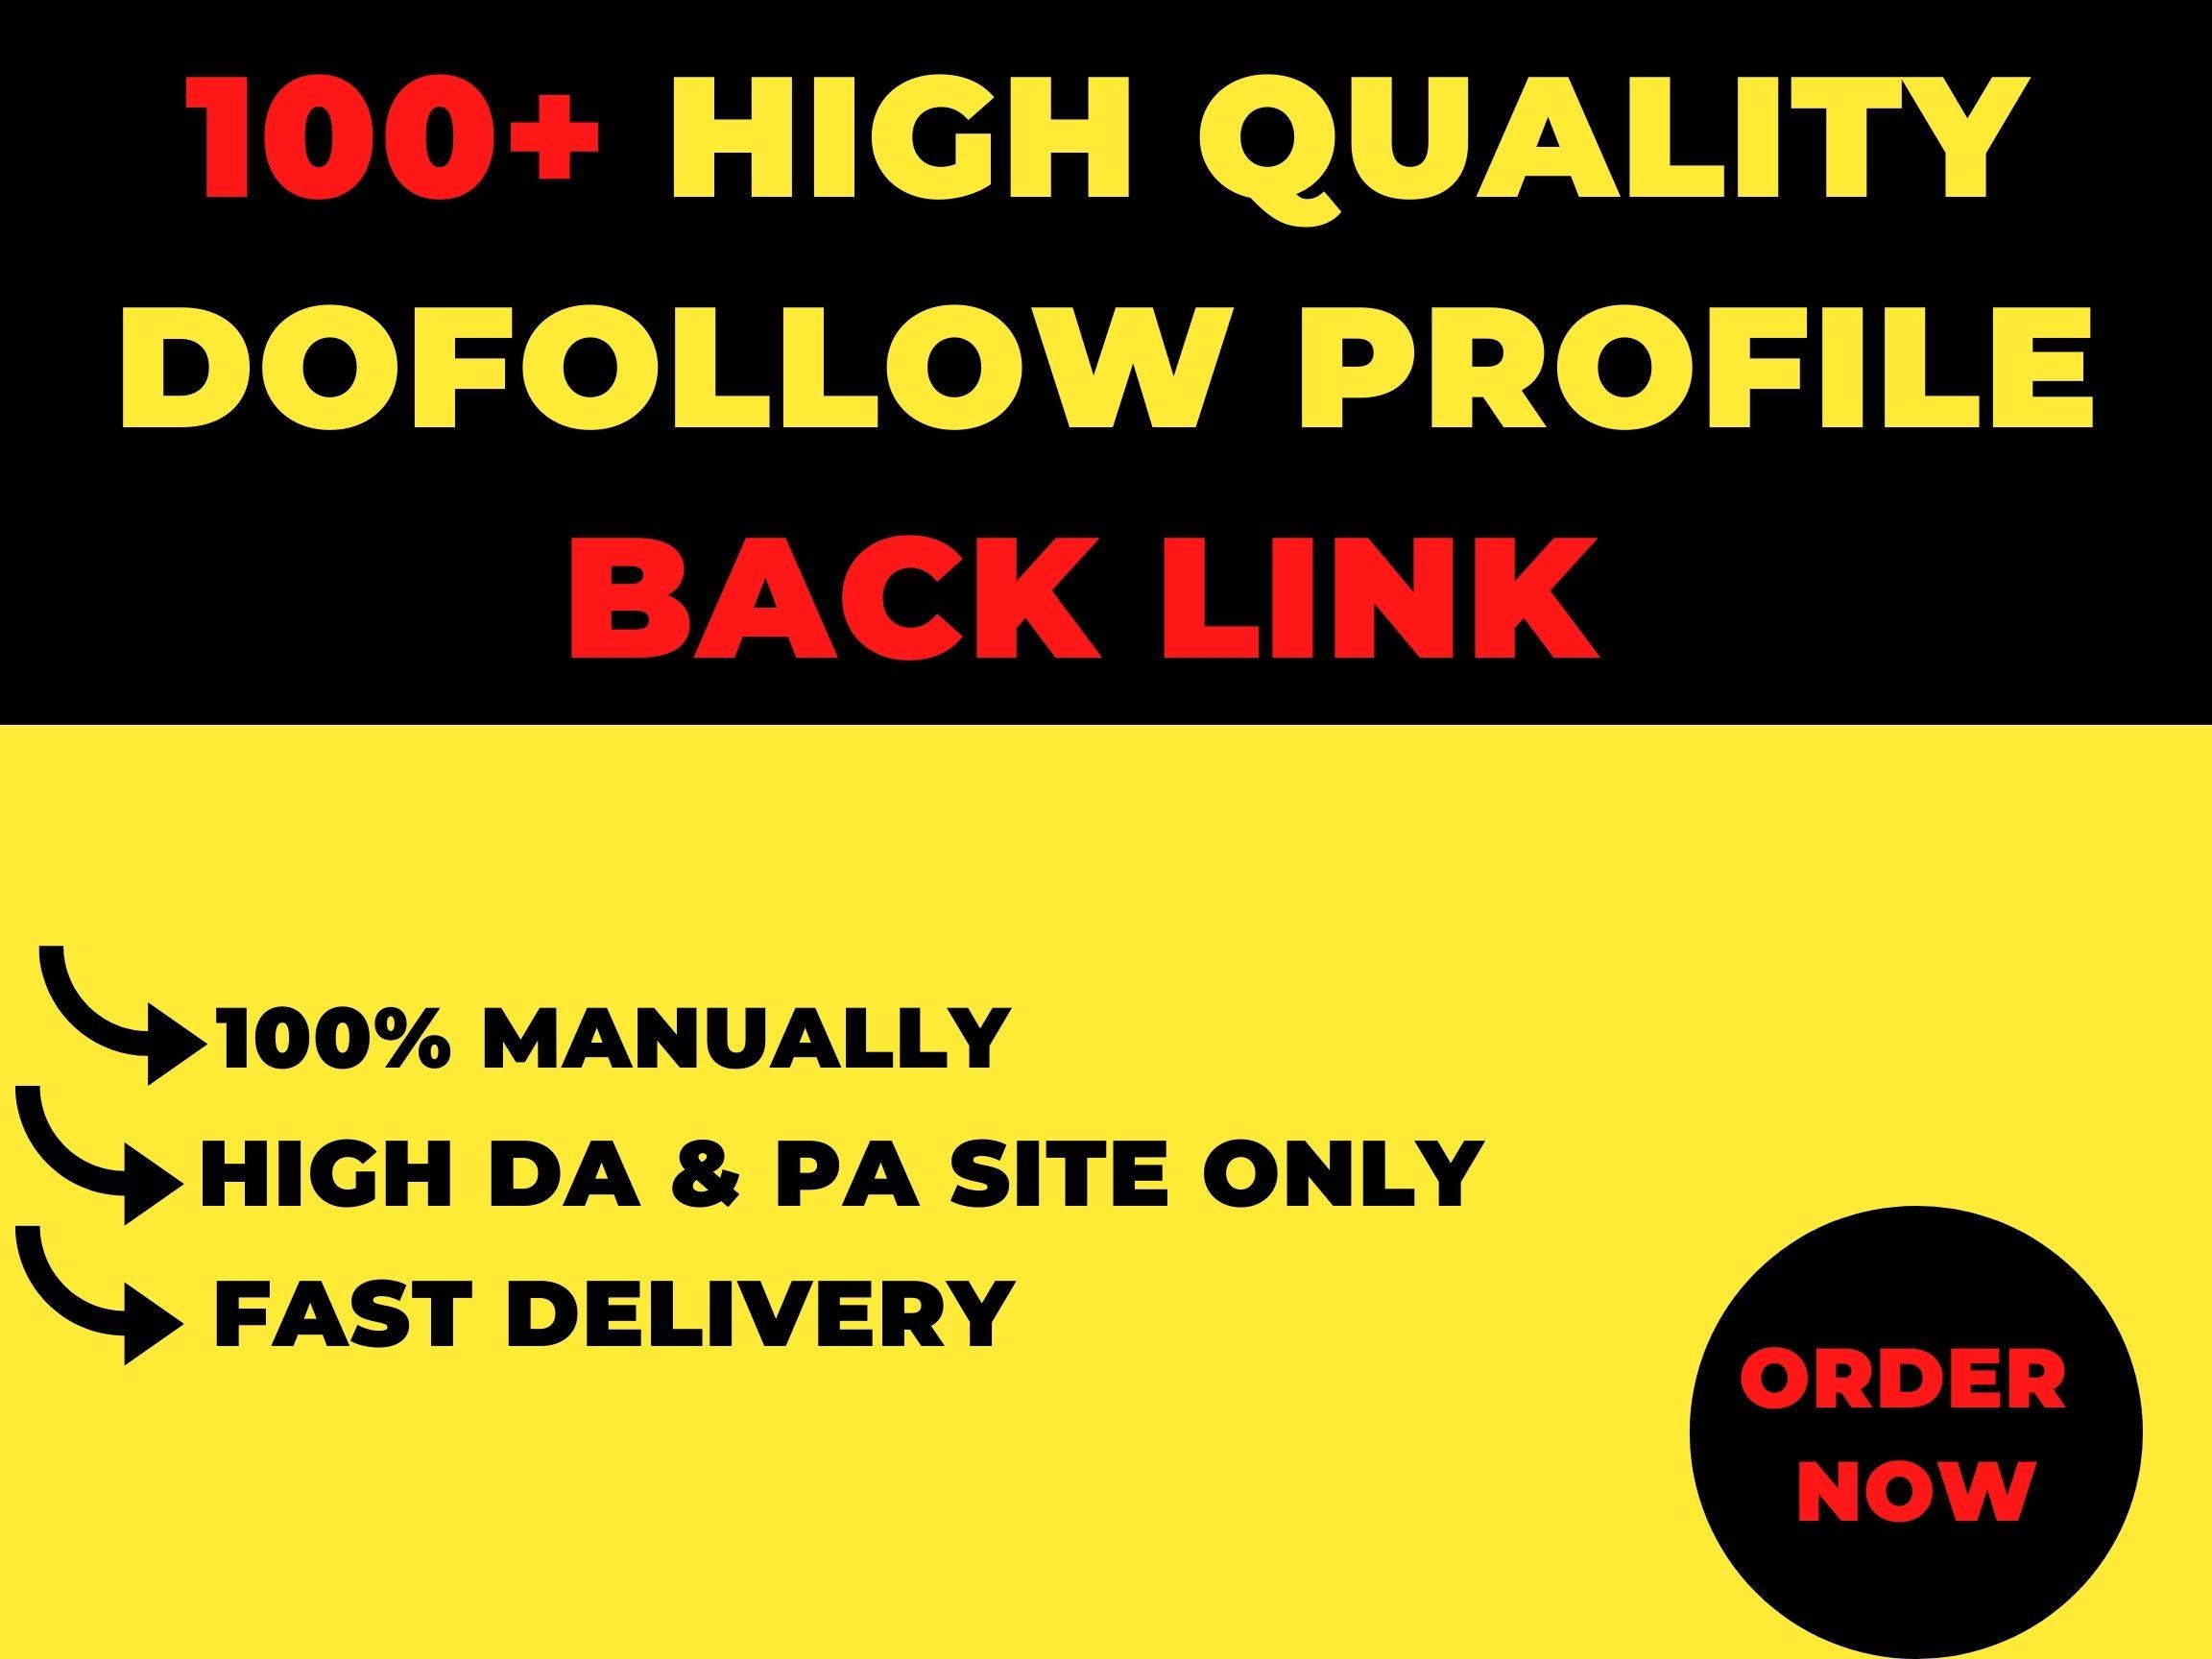 I will create 100+High Quality Dofollow Profile Backlinks